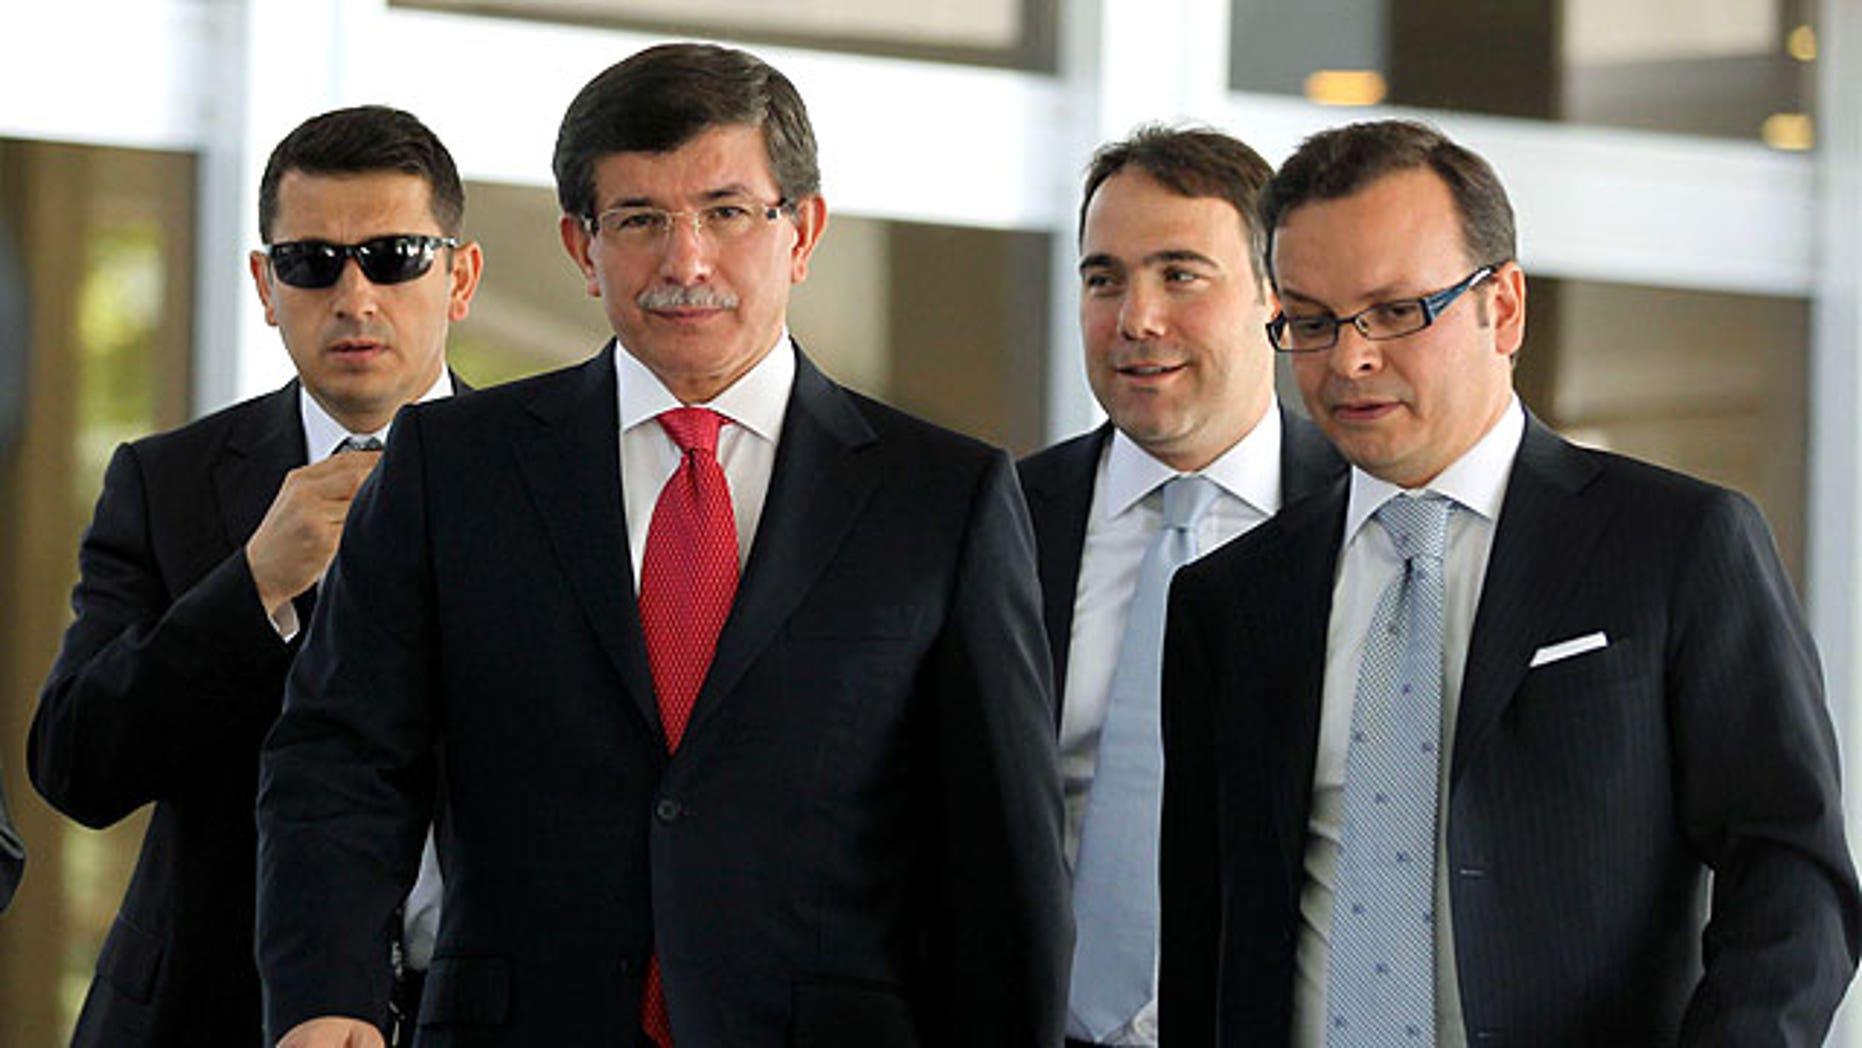 September 2: Turkish Foreign Minister Ahmet Davutoglu, centre left, leads advisors as he arrives to speak to the media in Ankara, Turkey.